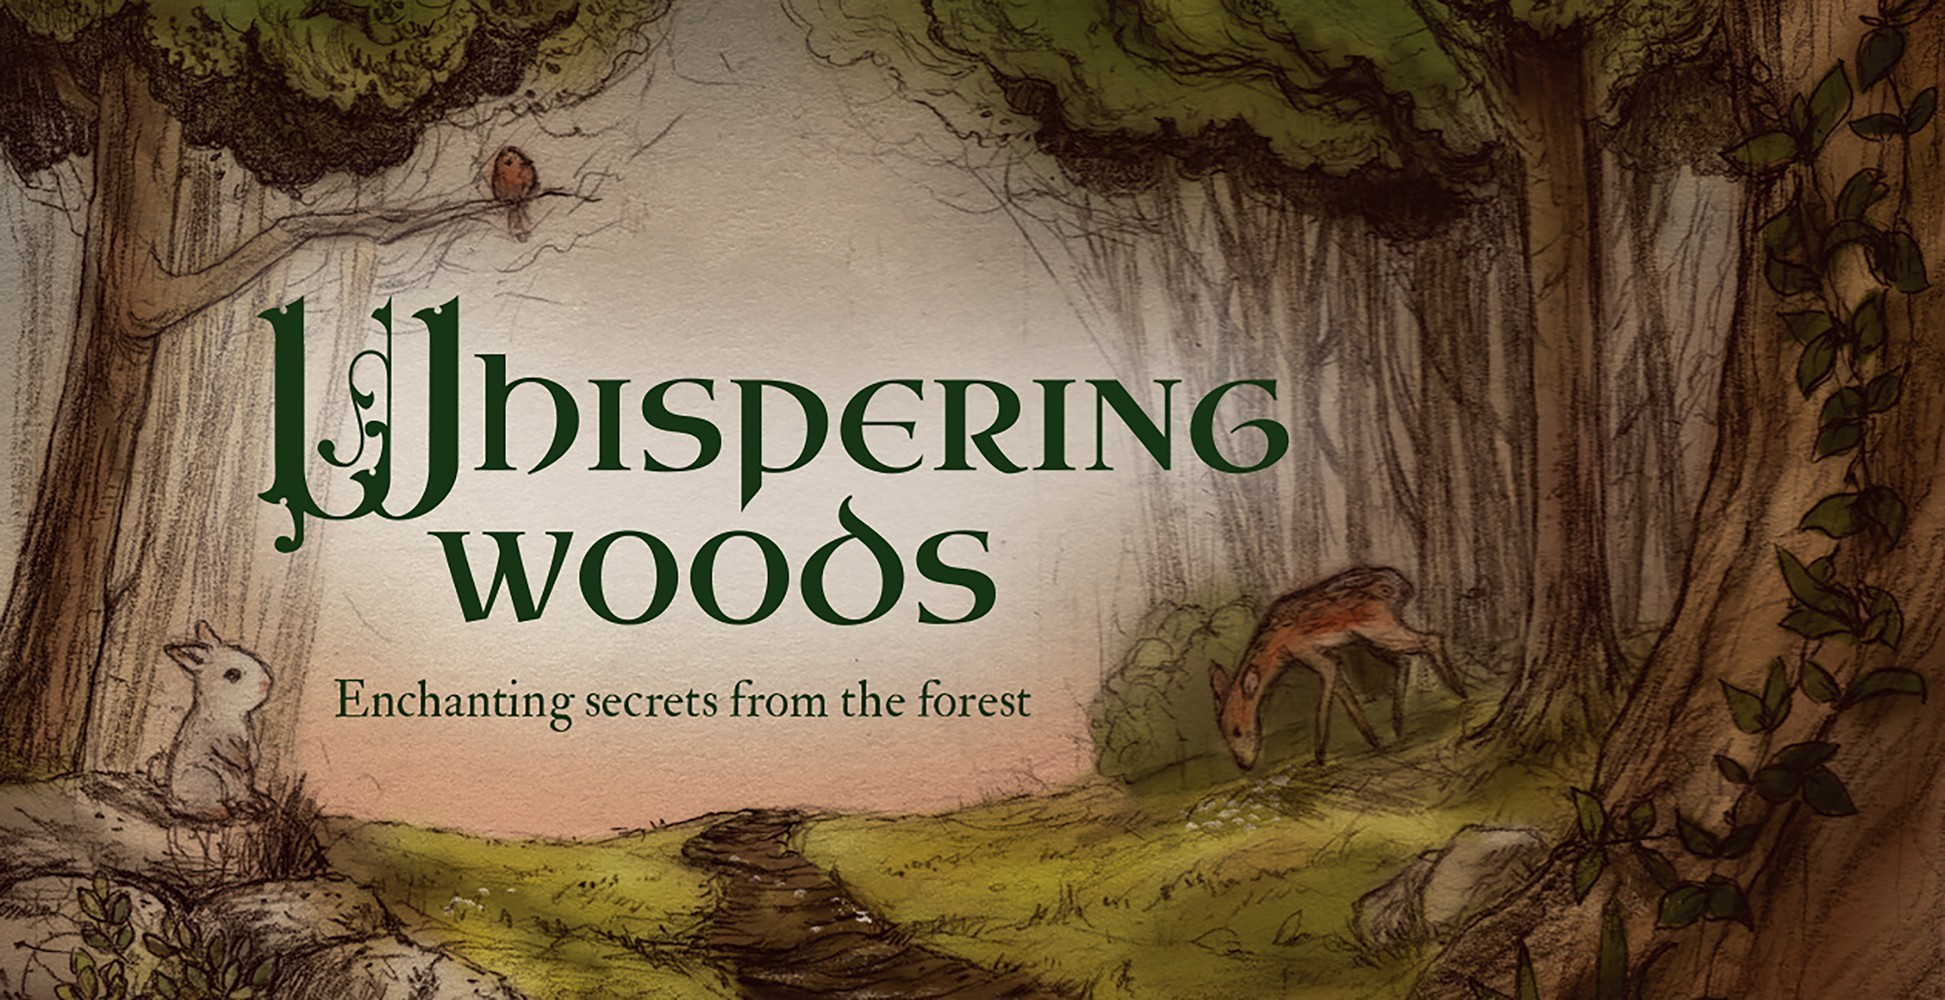 森林絮語_珠玉集:Whispering Woods Inspiration Cards.jpg